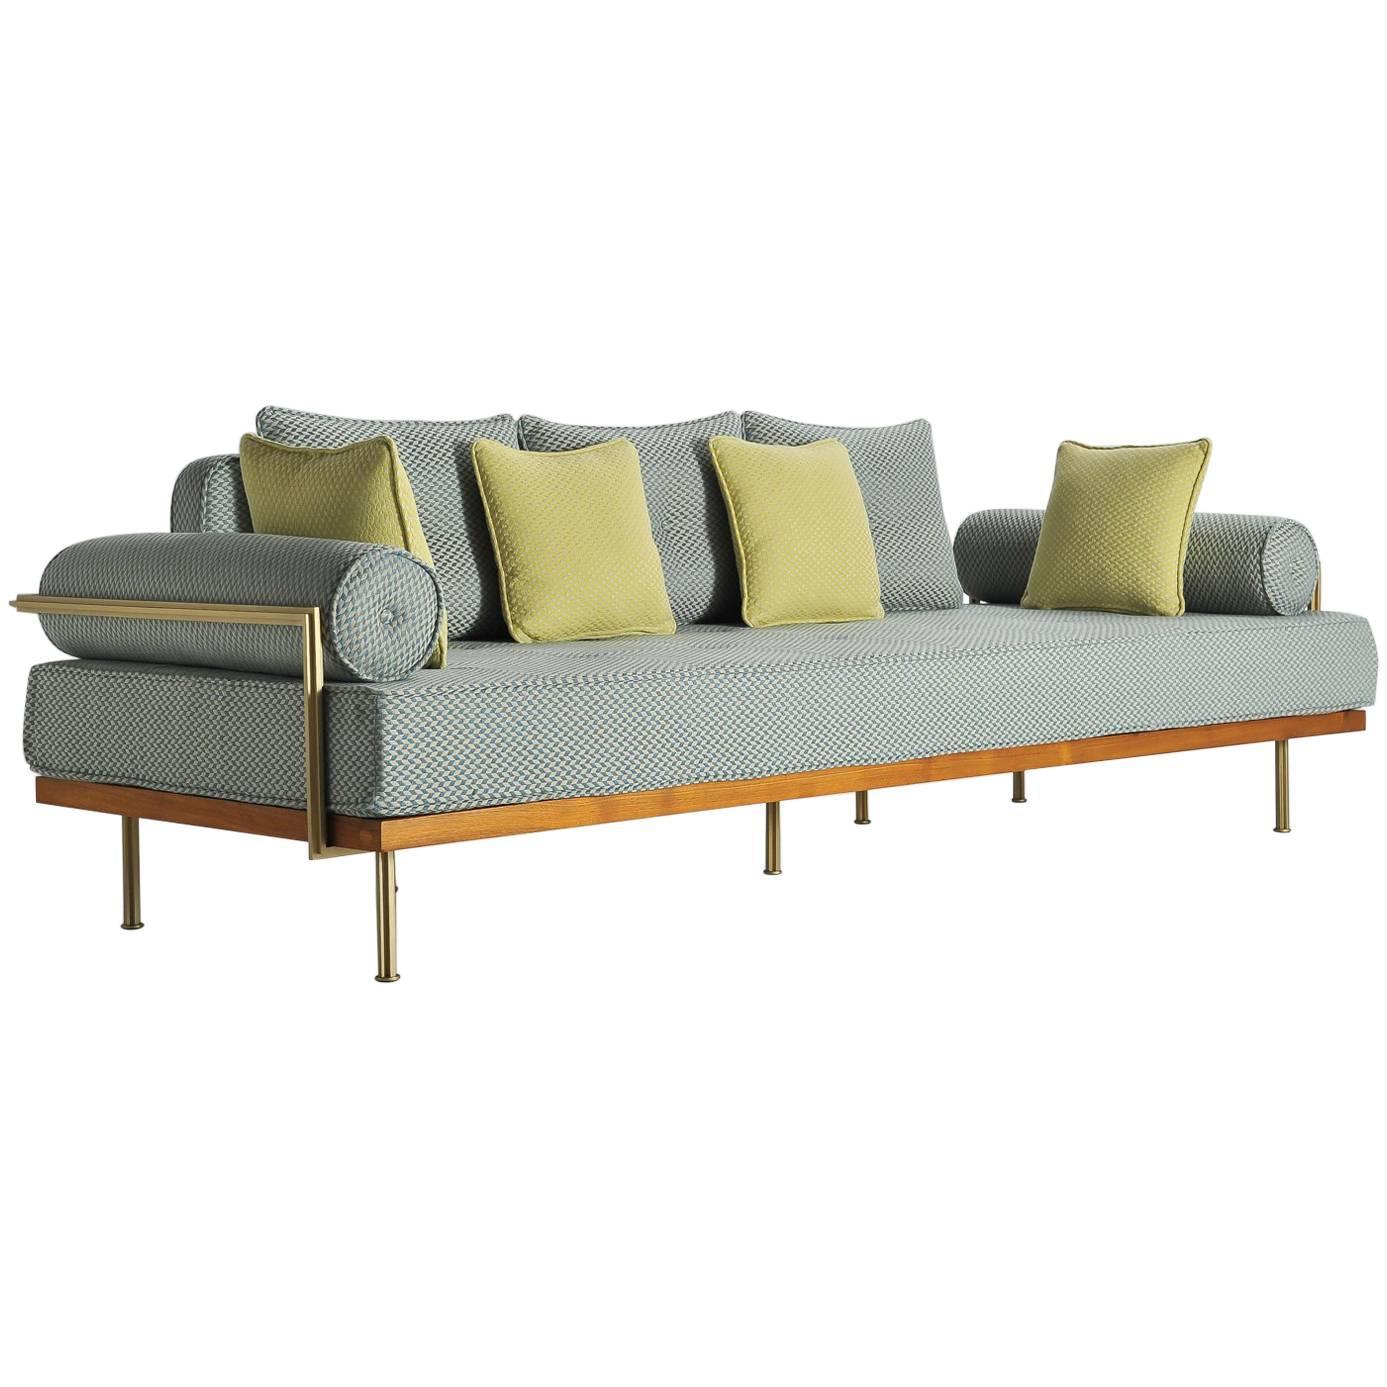 Mid Century Modern Style Sofa, Reclaimed Hardwood, Brass Frames For Sale